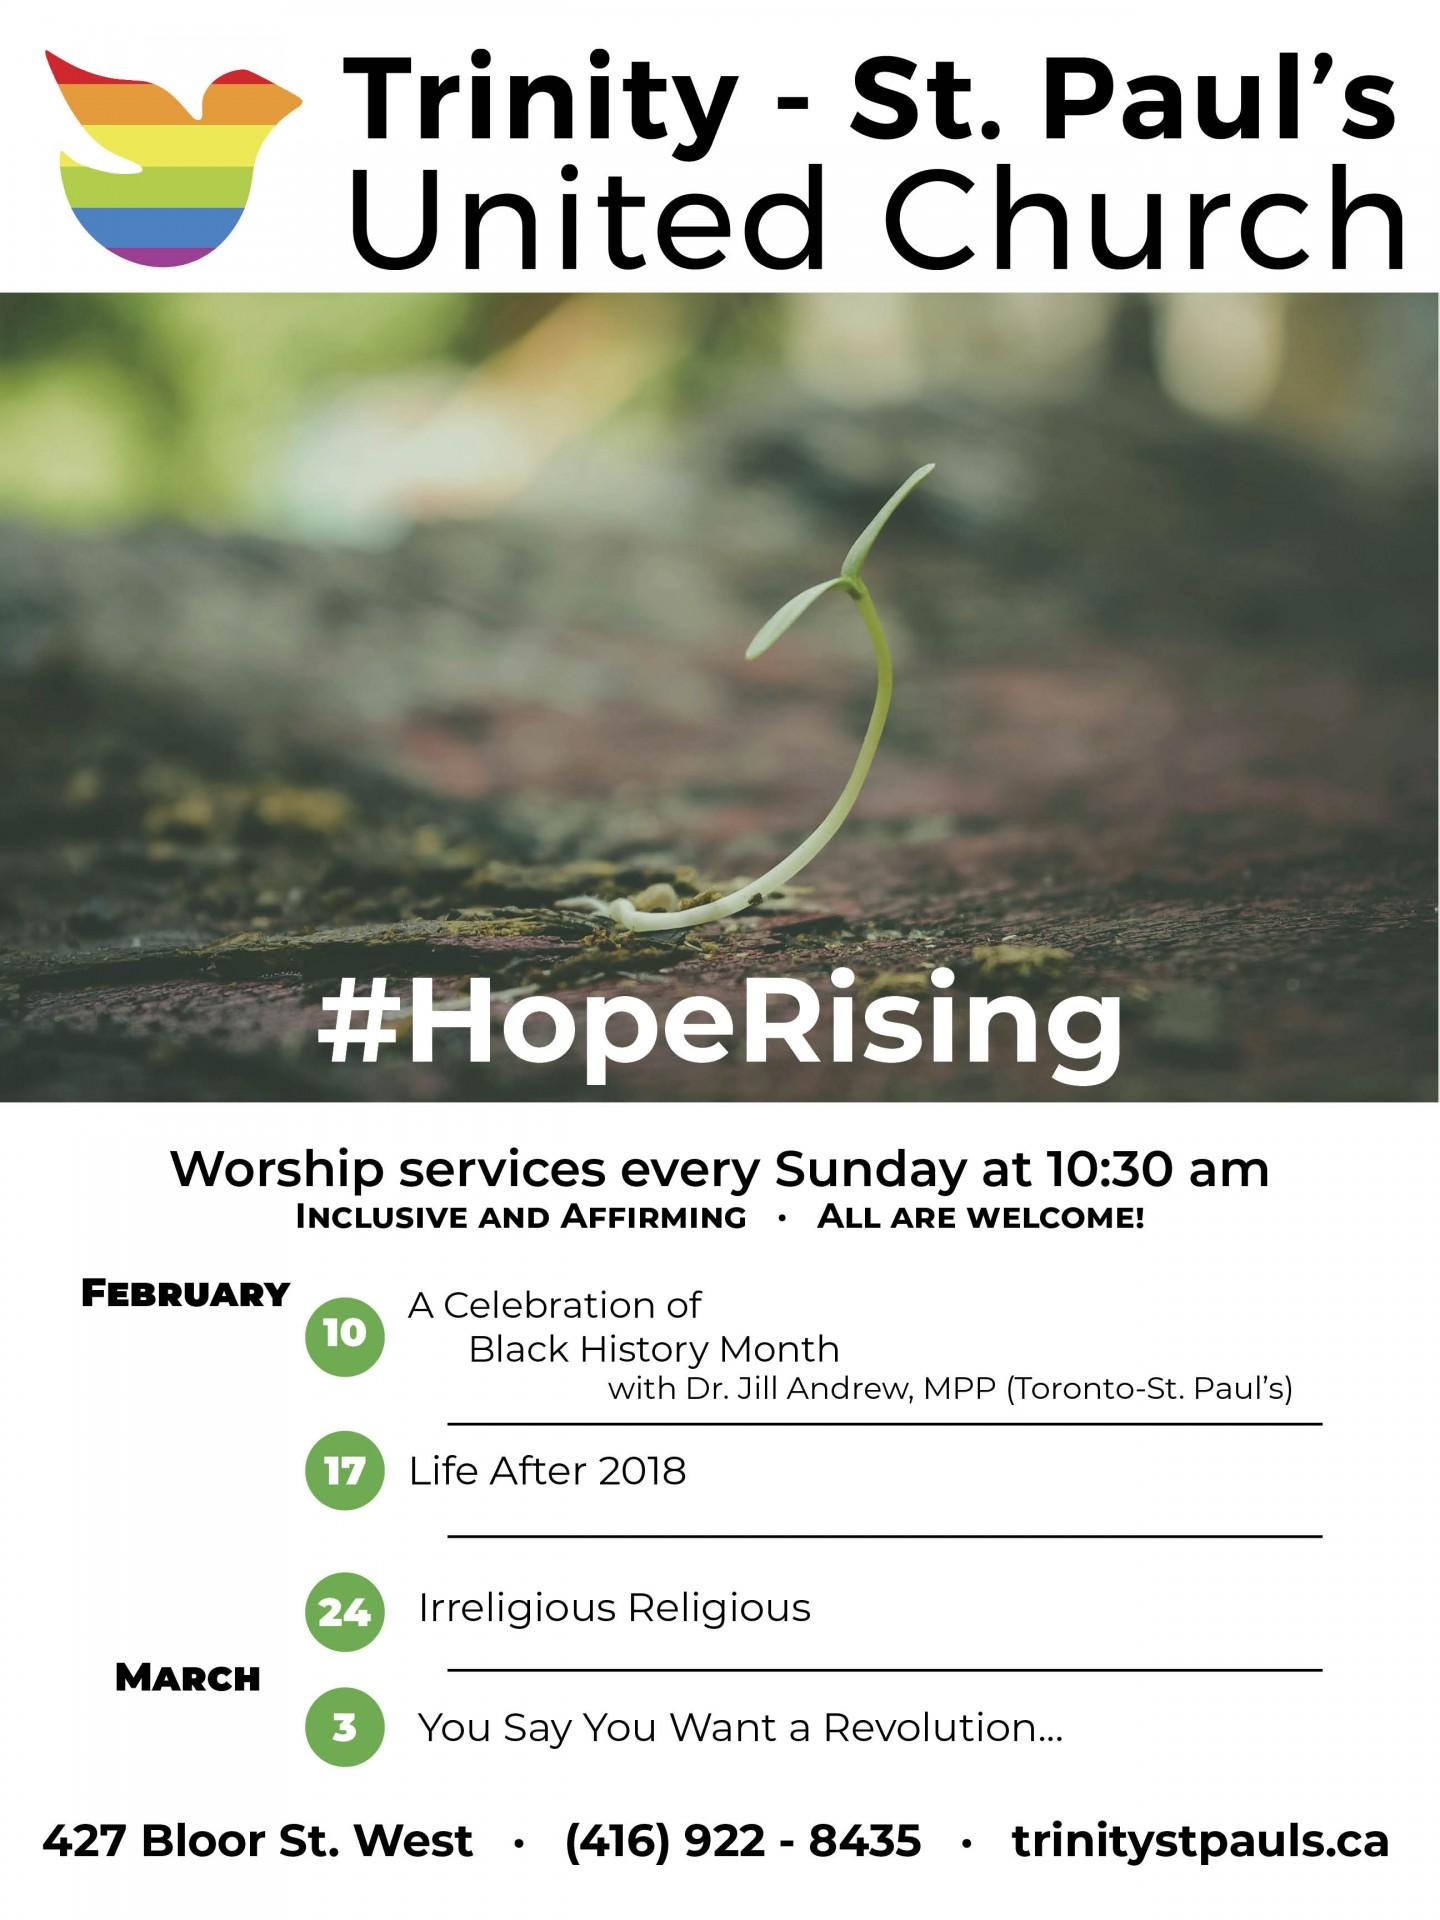 hoperising2_web